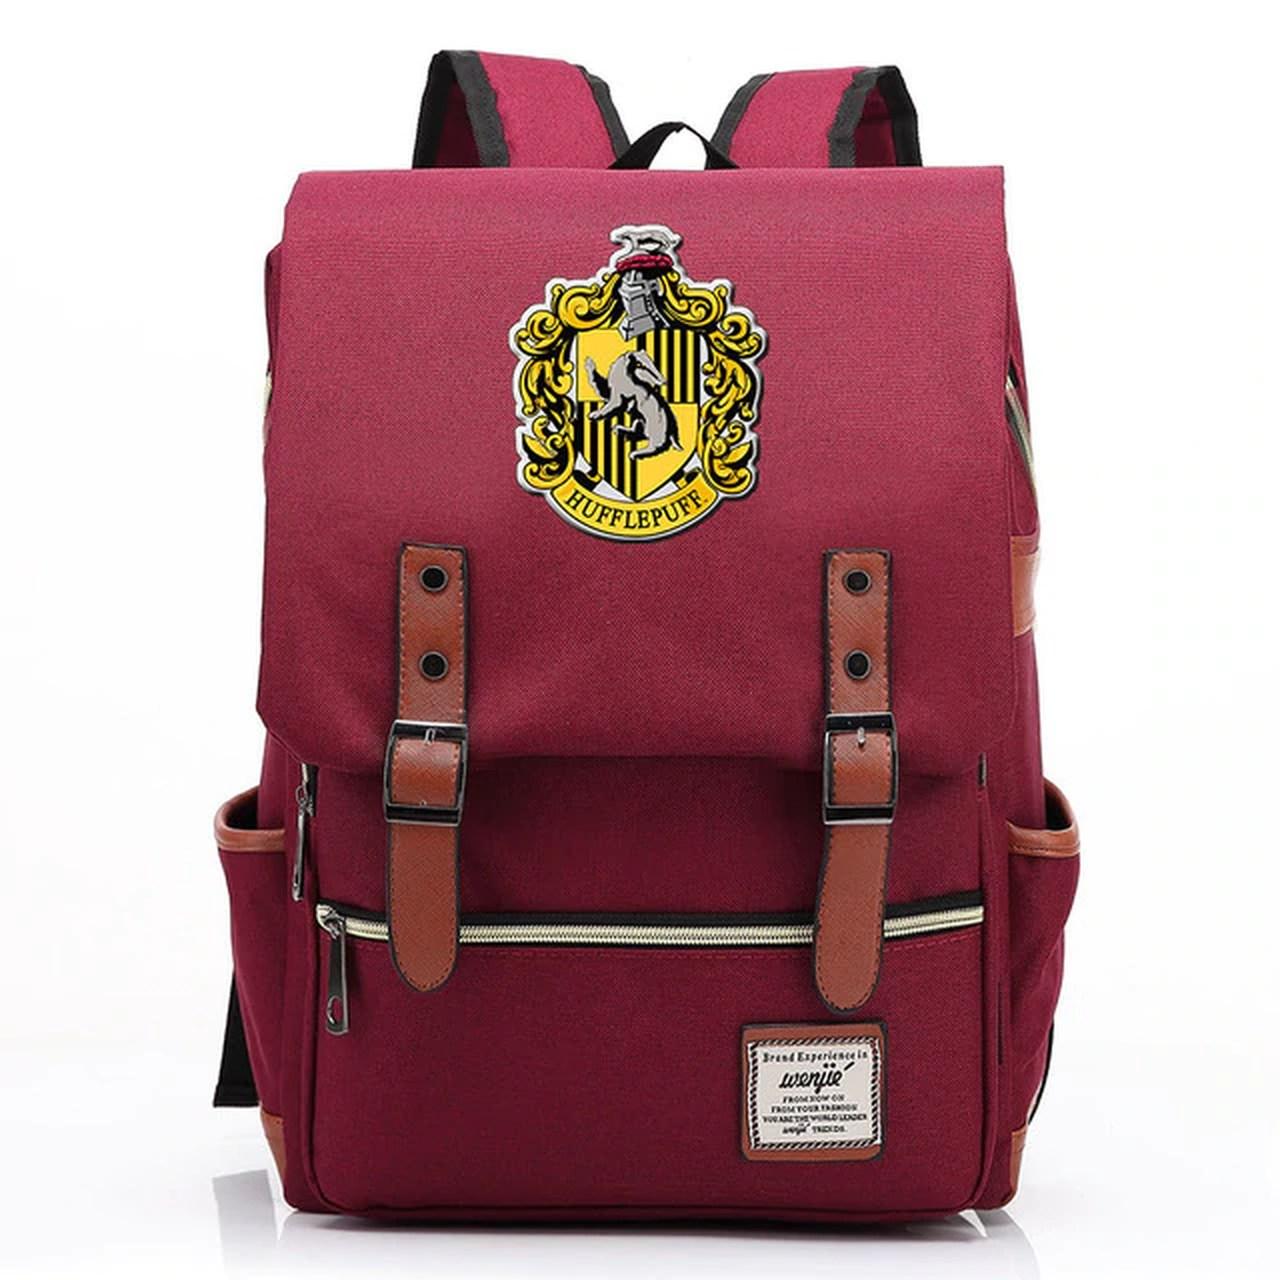 Mochila Hogwarts Casa Lufa-Lufa: Harry Potter (Vermelho)